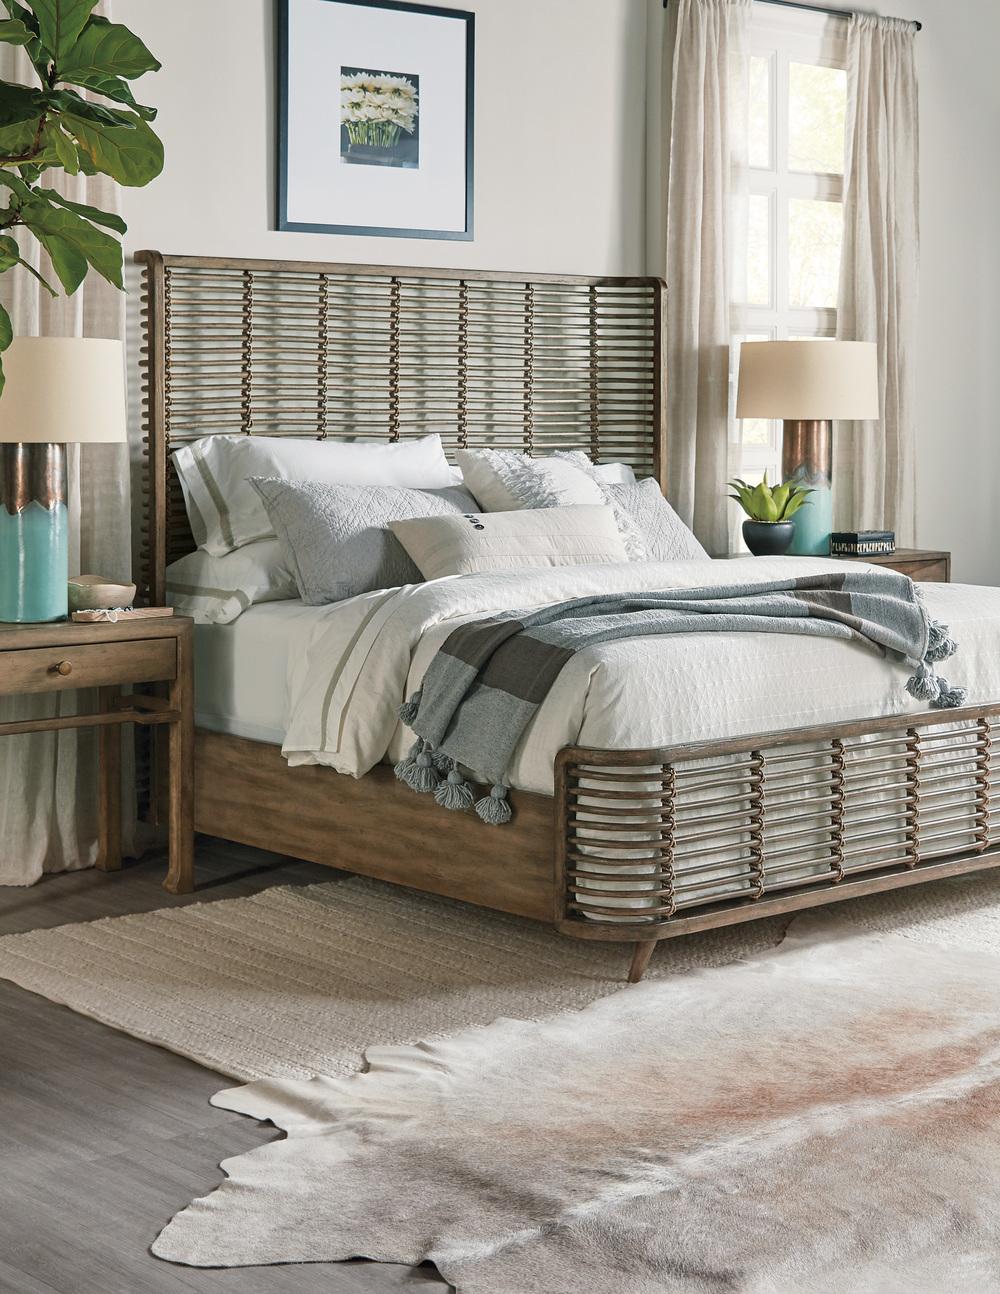 Hooker Furniture - California King Rattan Bed